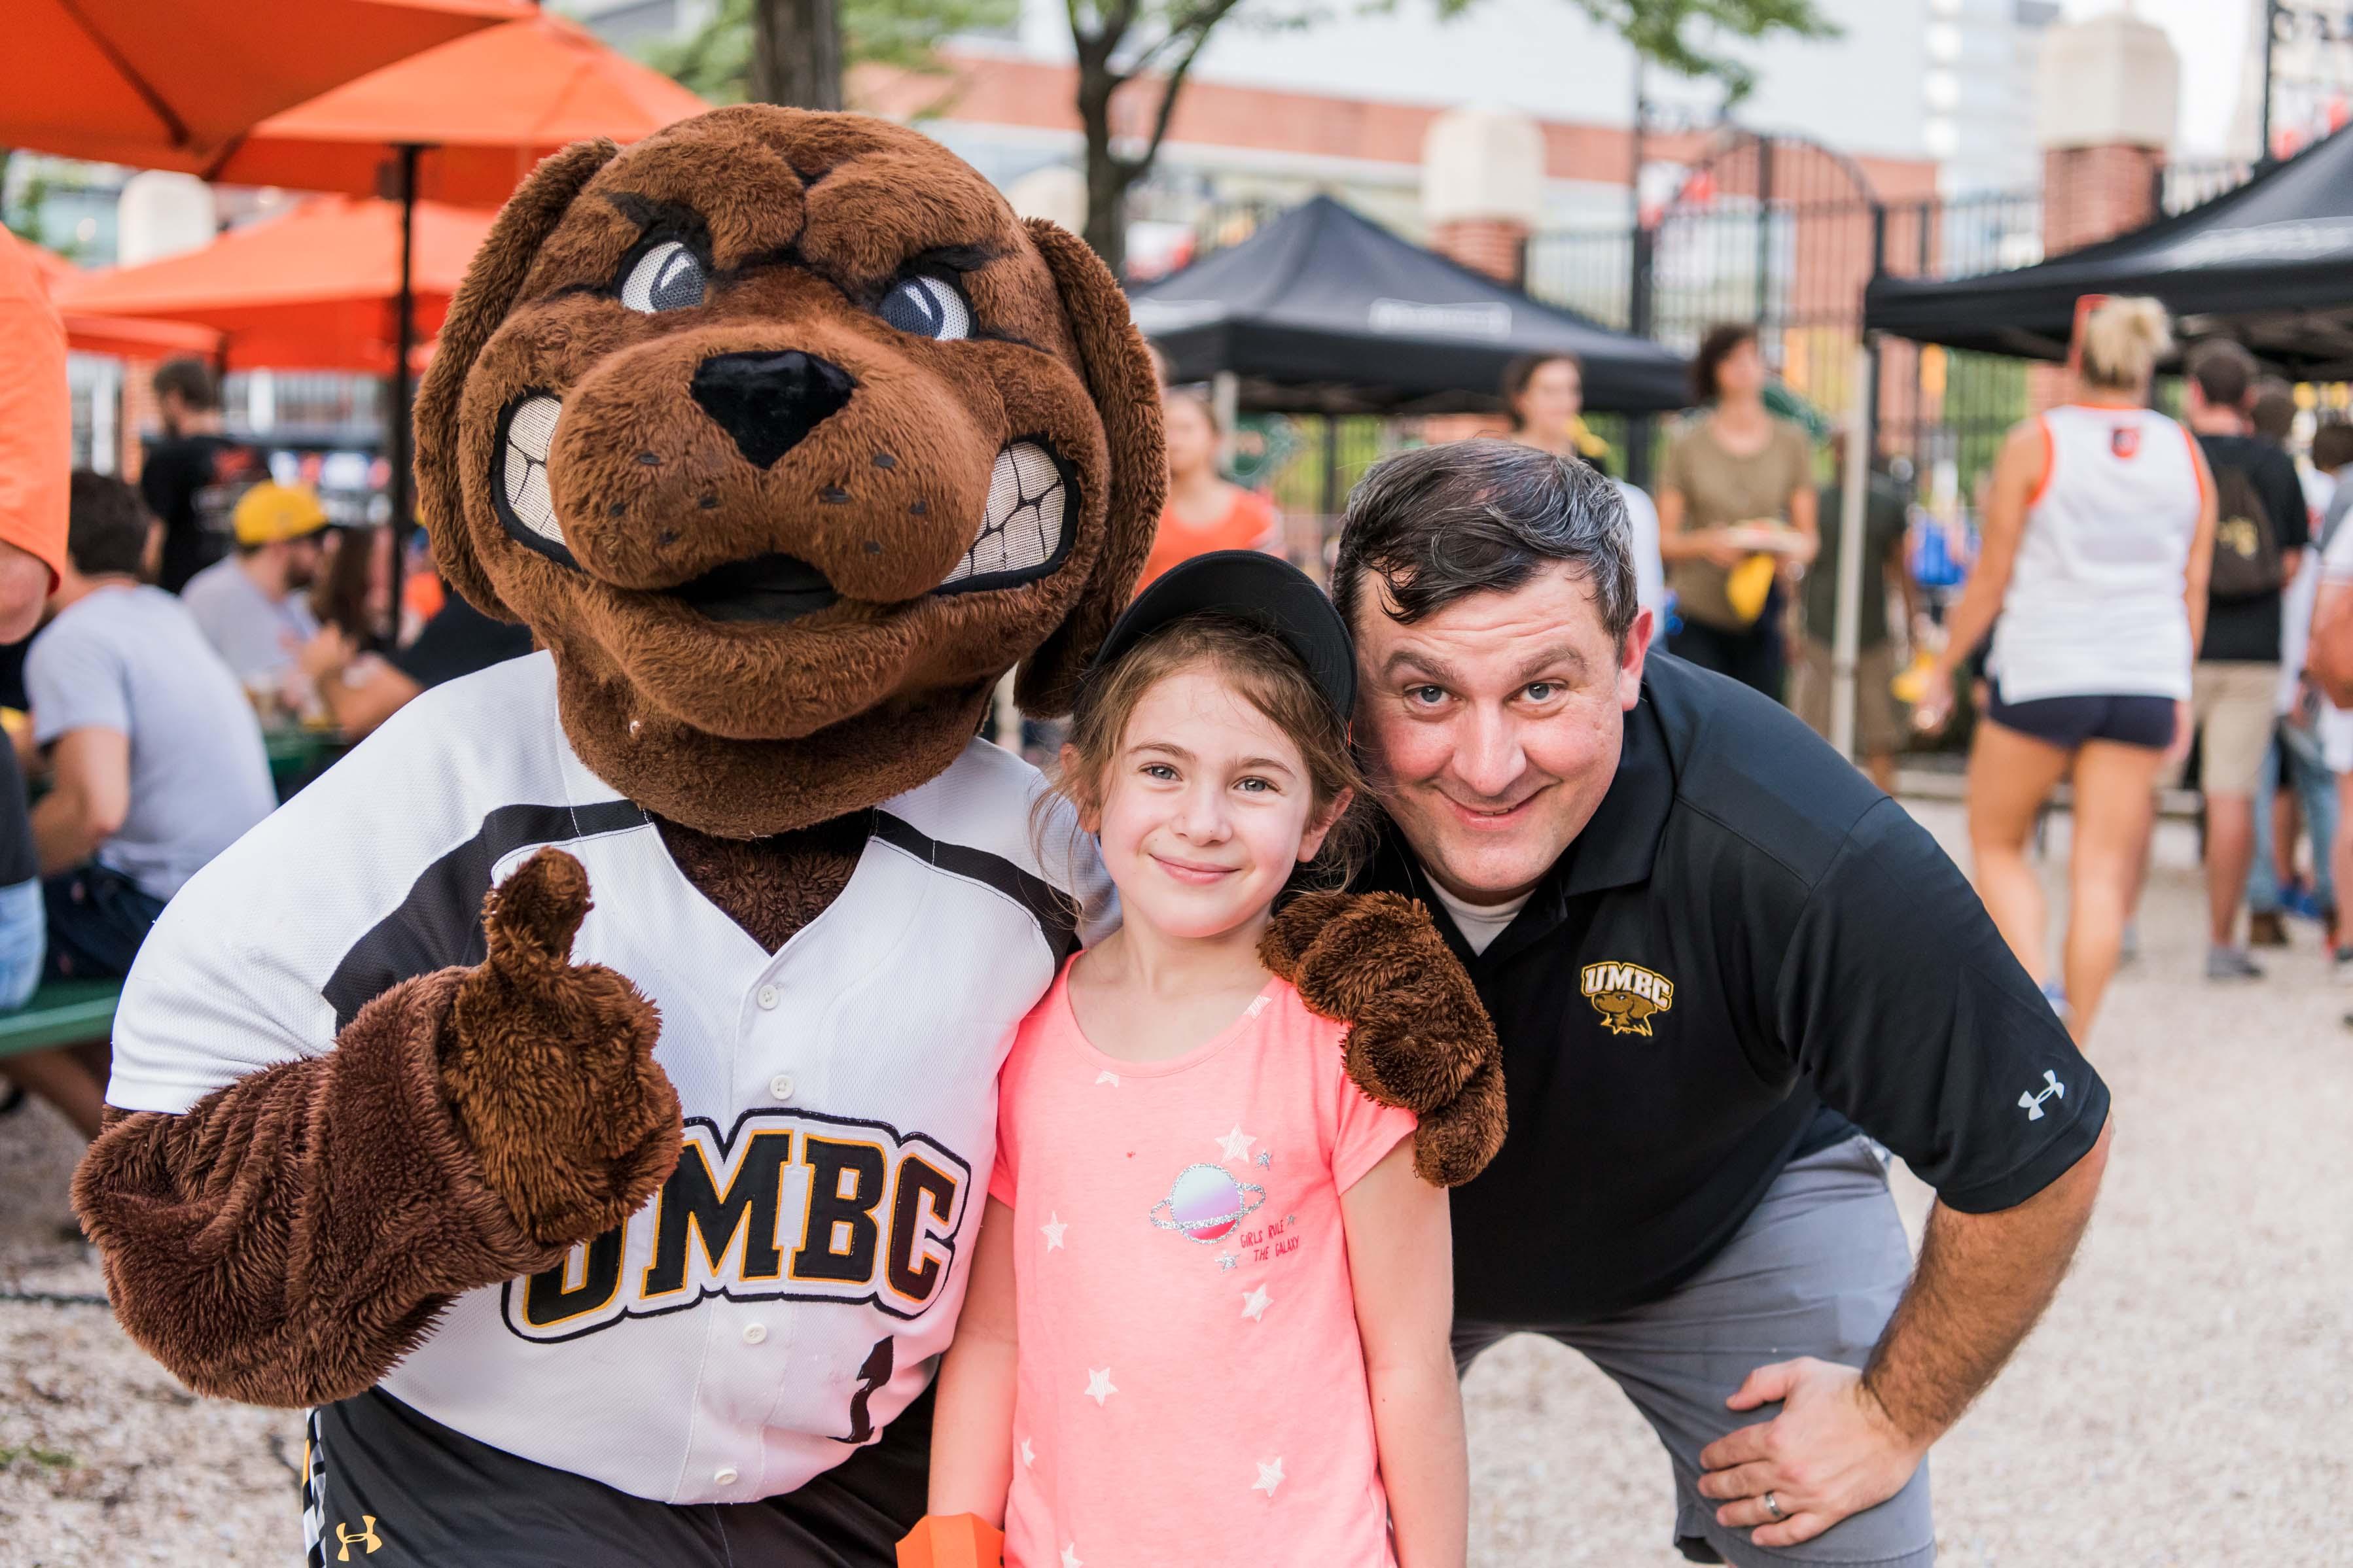 UMBC Mascot and fans at Camden Yards